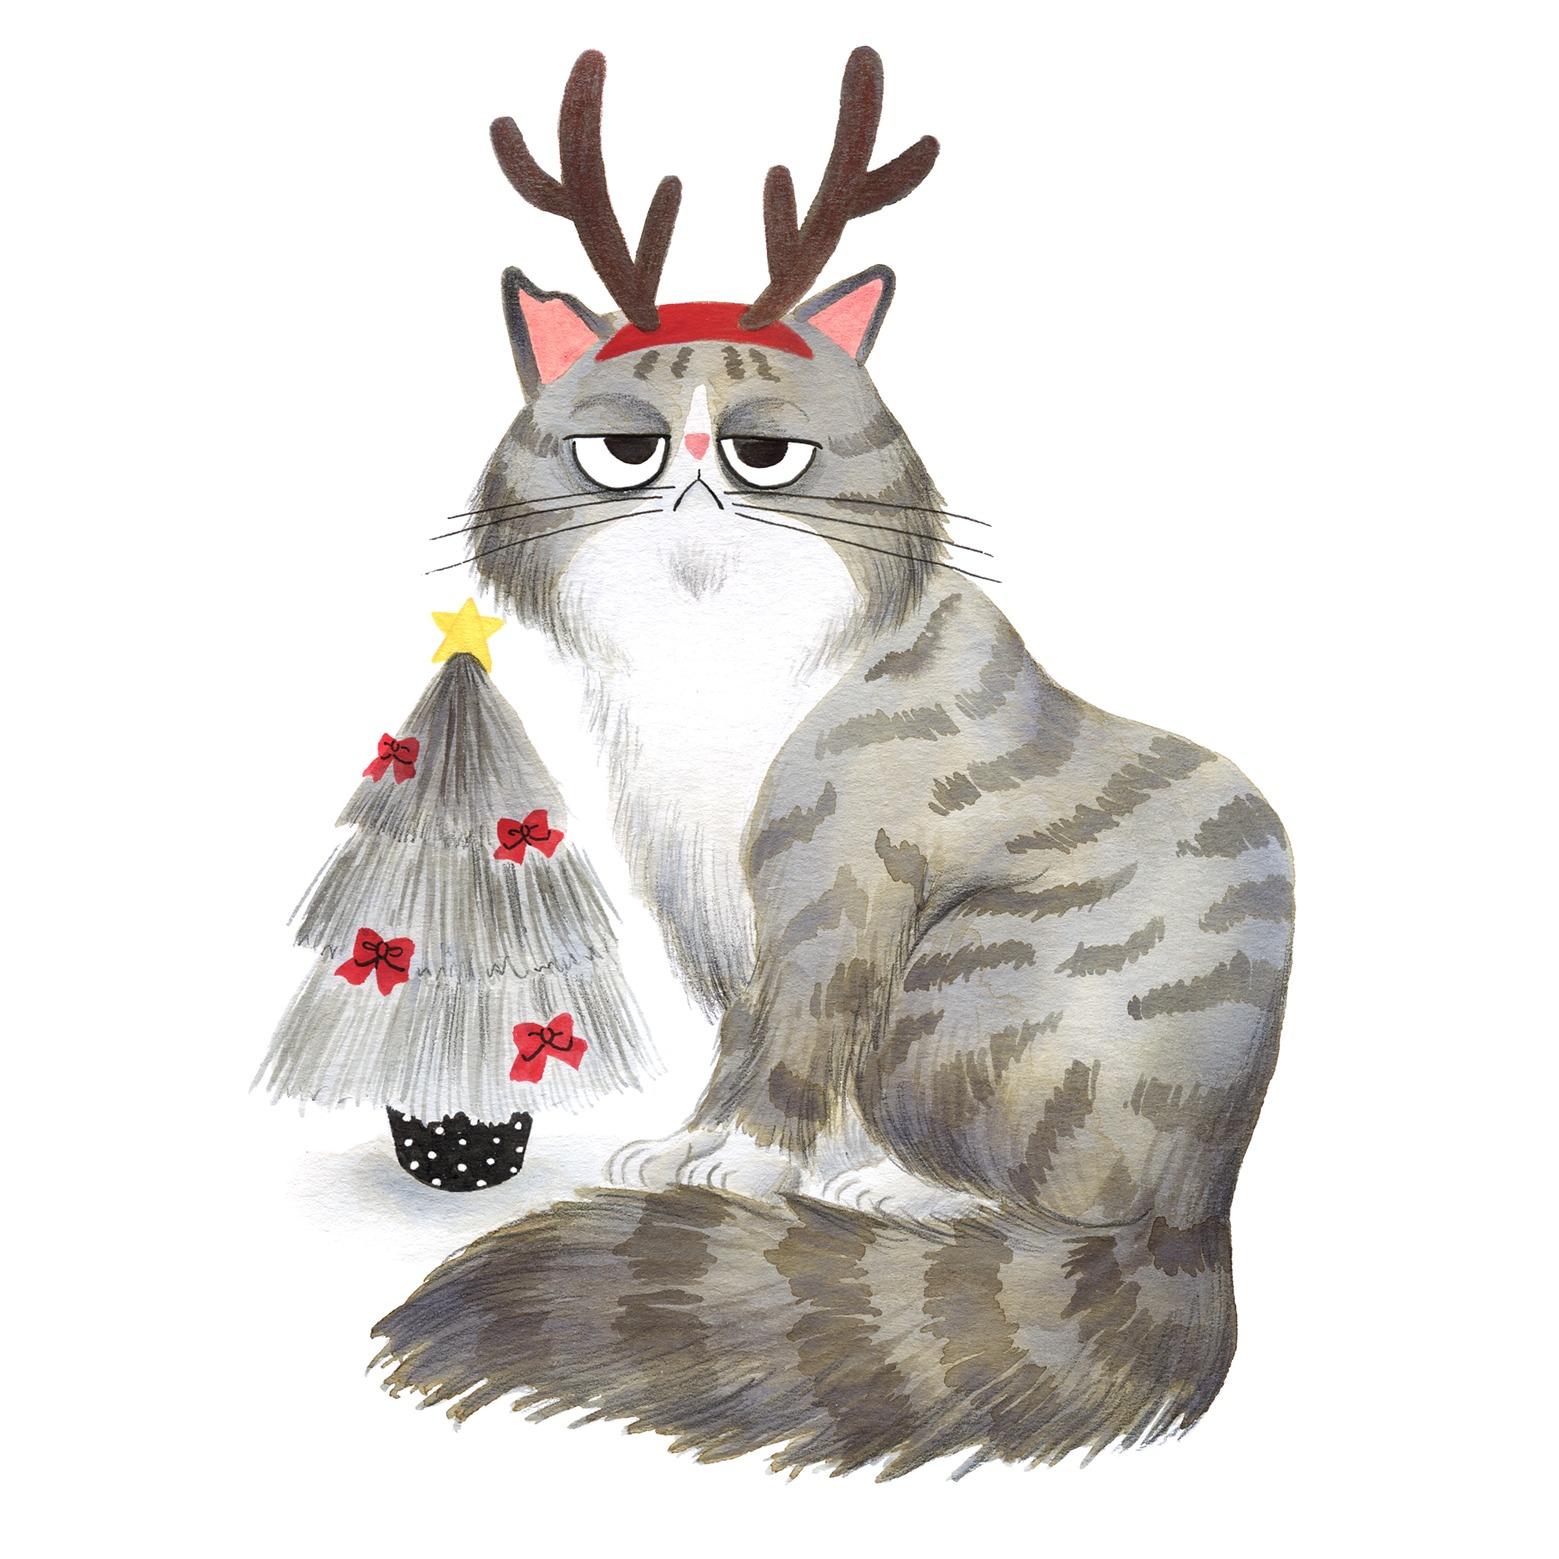 Ilustración de gato, Inktober, gato navideño, retrato de gato